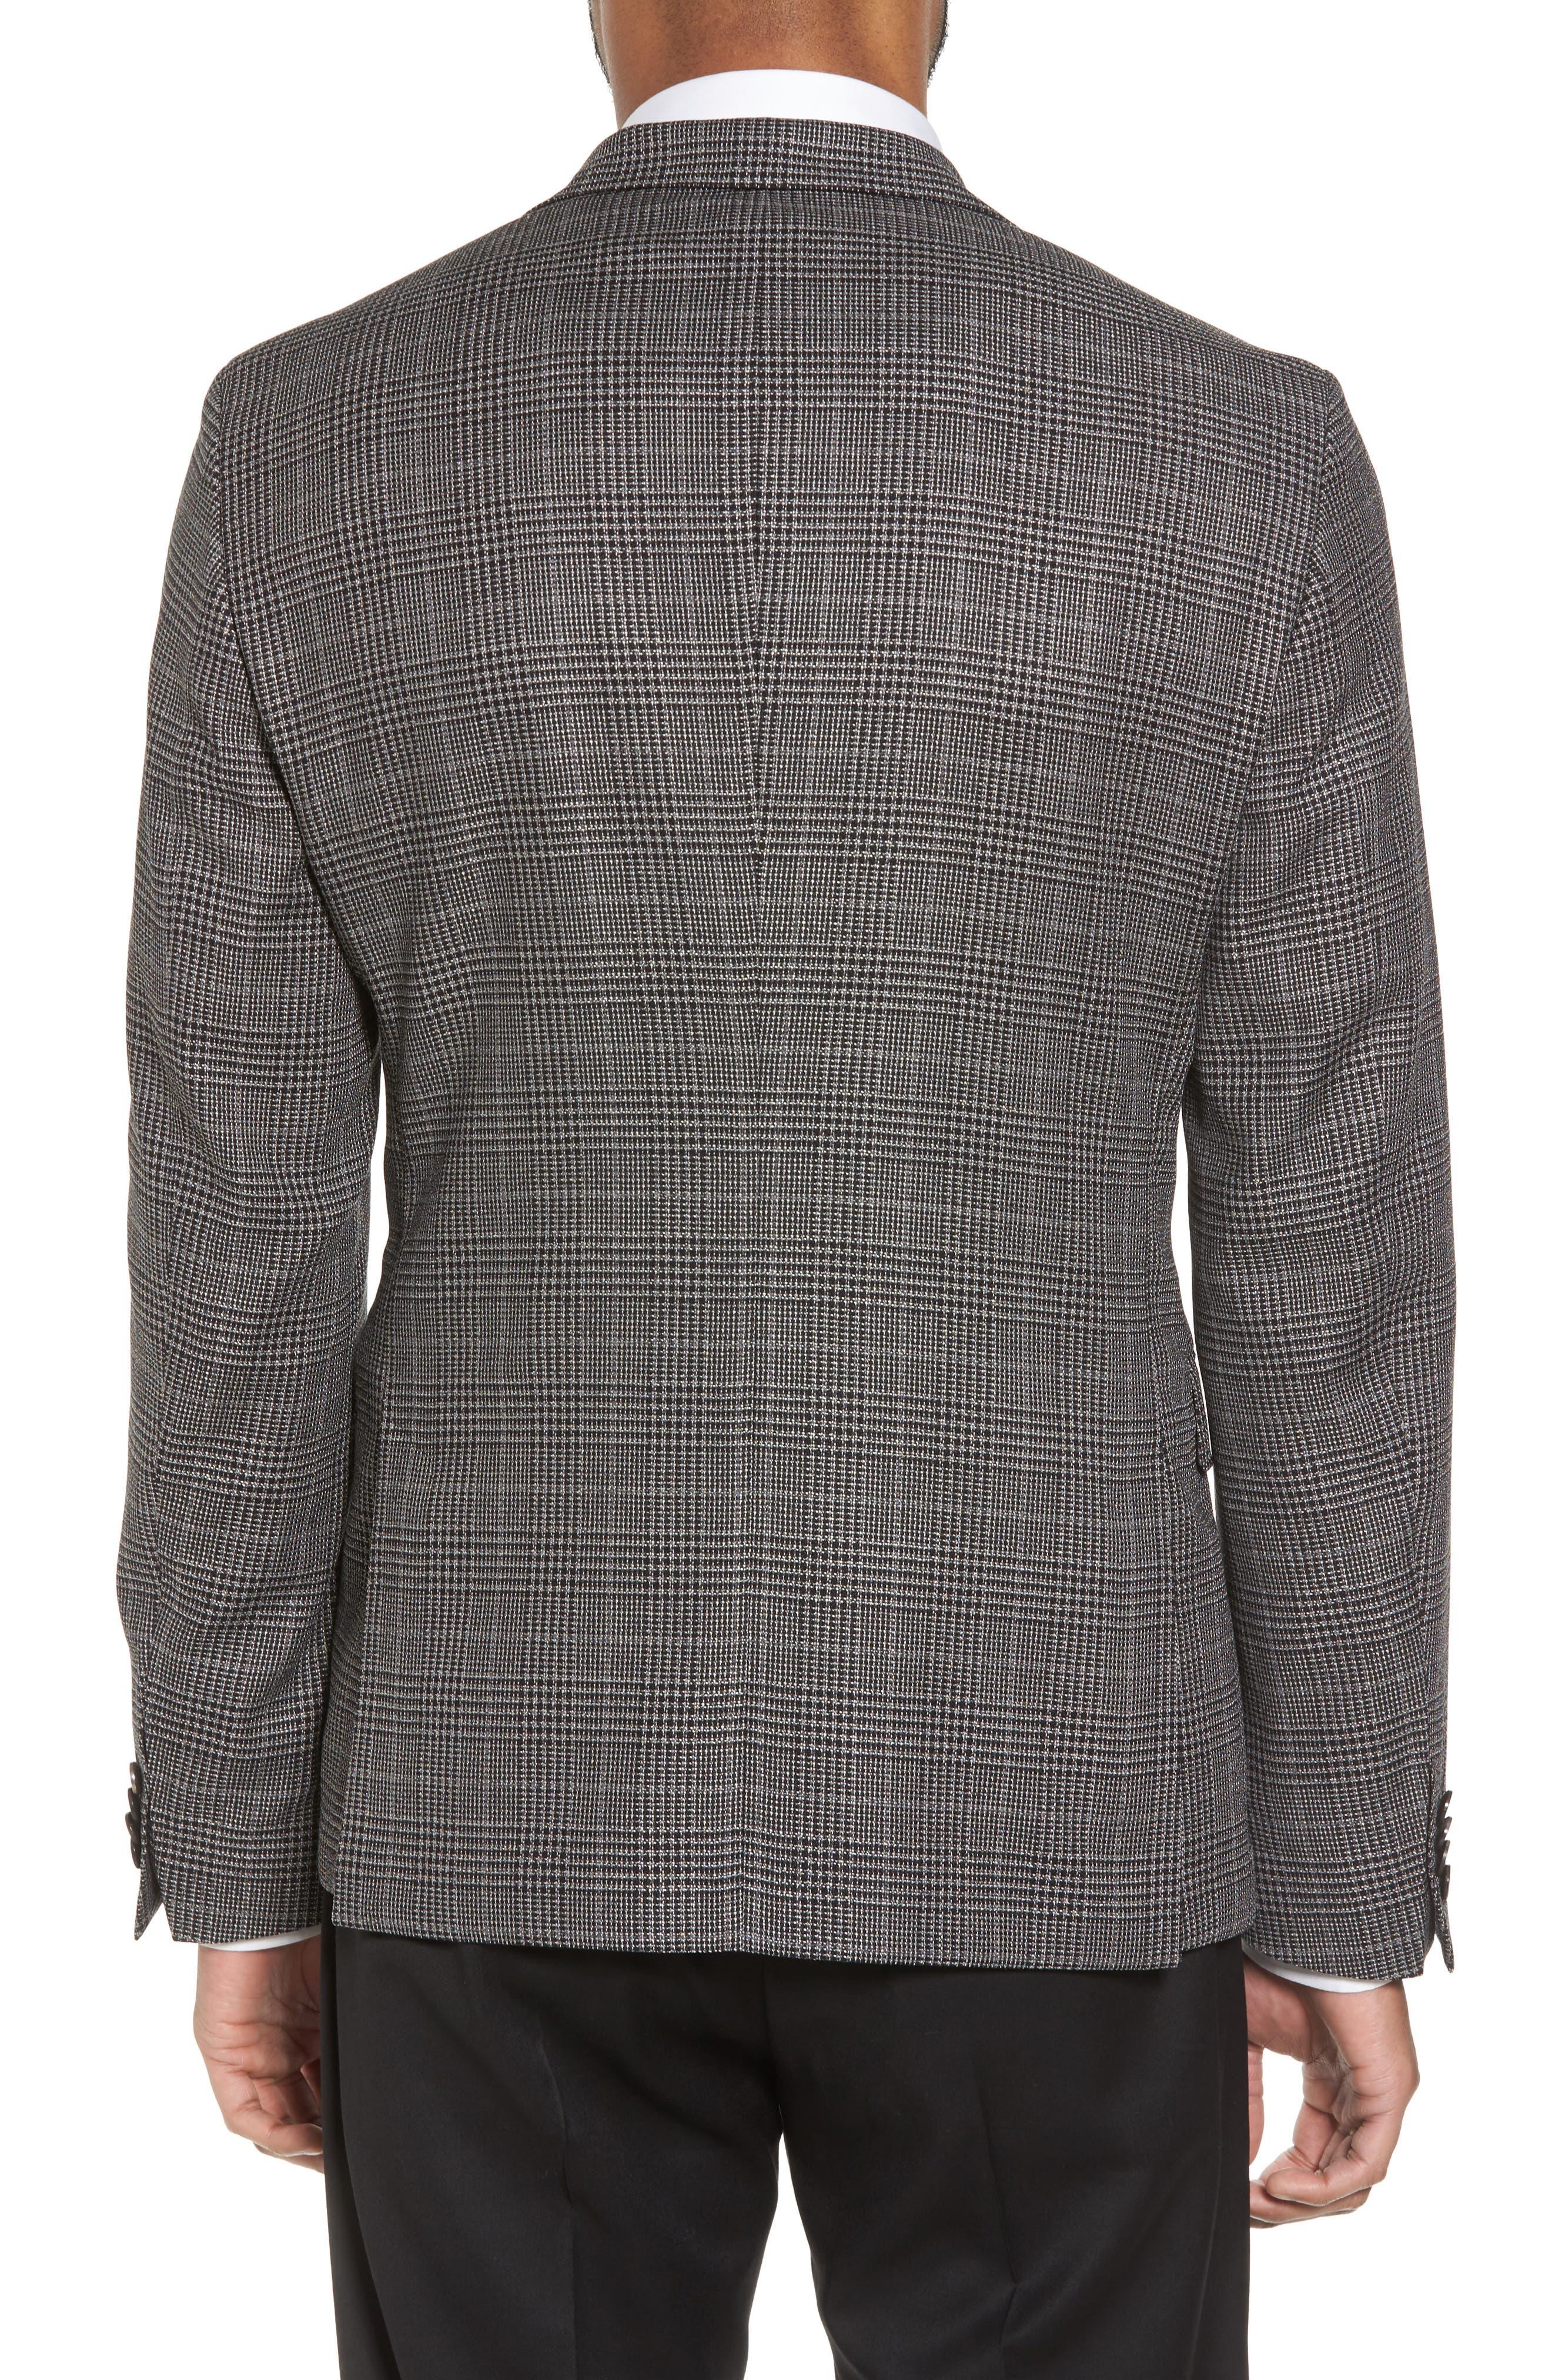 Nobis Trim Fit Plaid Wool & Silk Blend Sport Coat,                             Alternate thumbnail 2, color,                             OPEN GREY